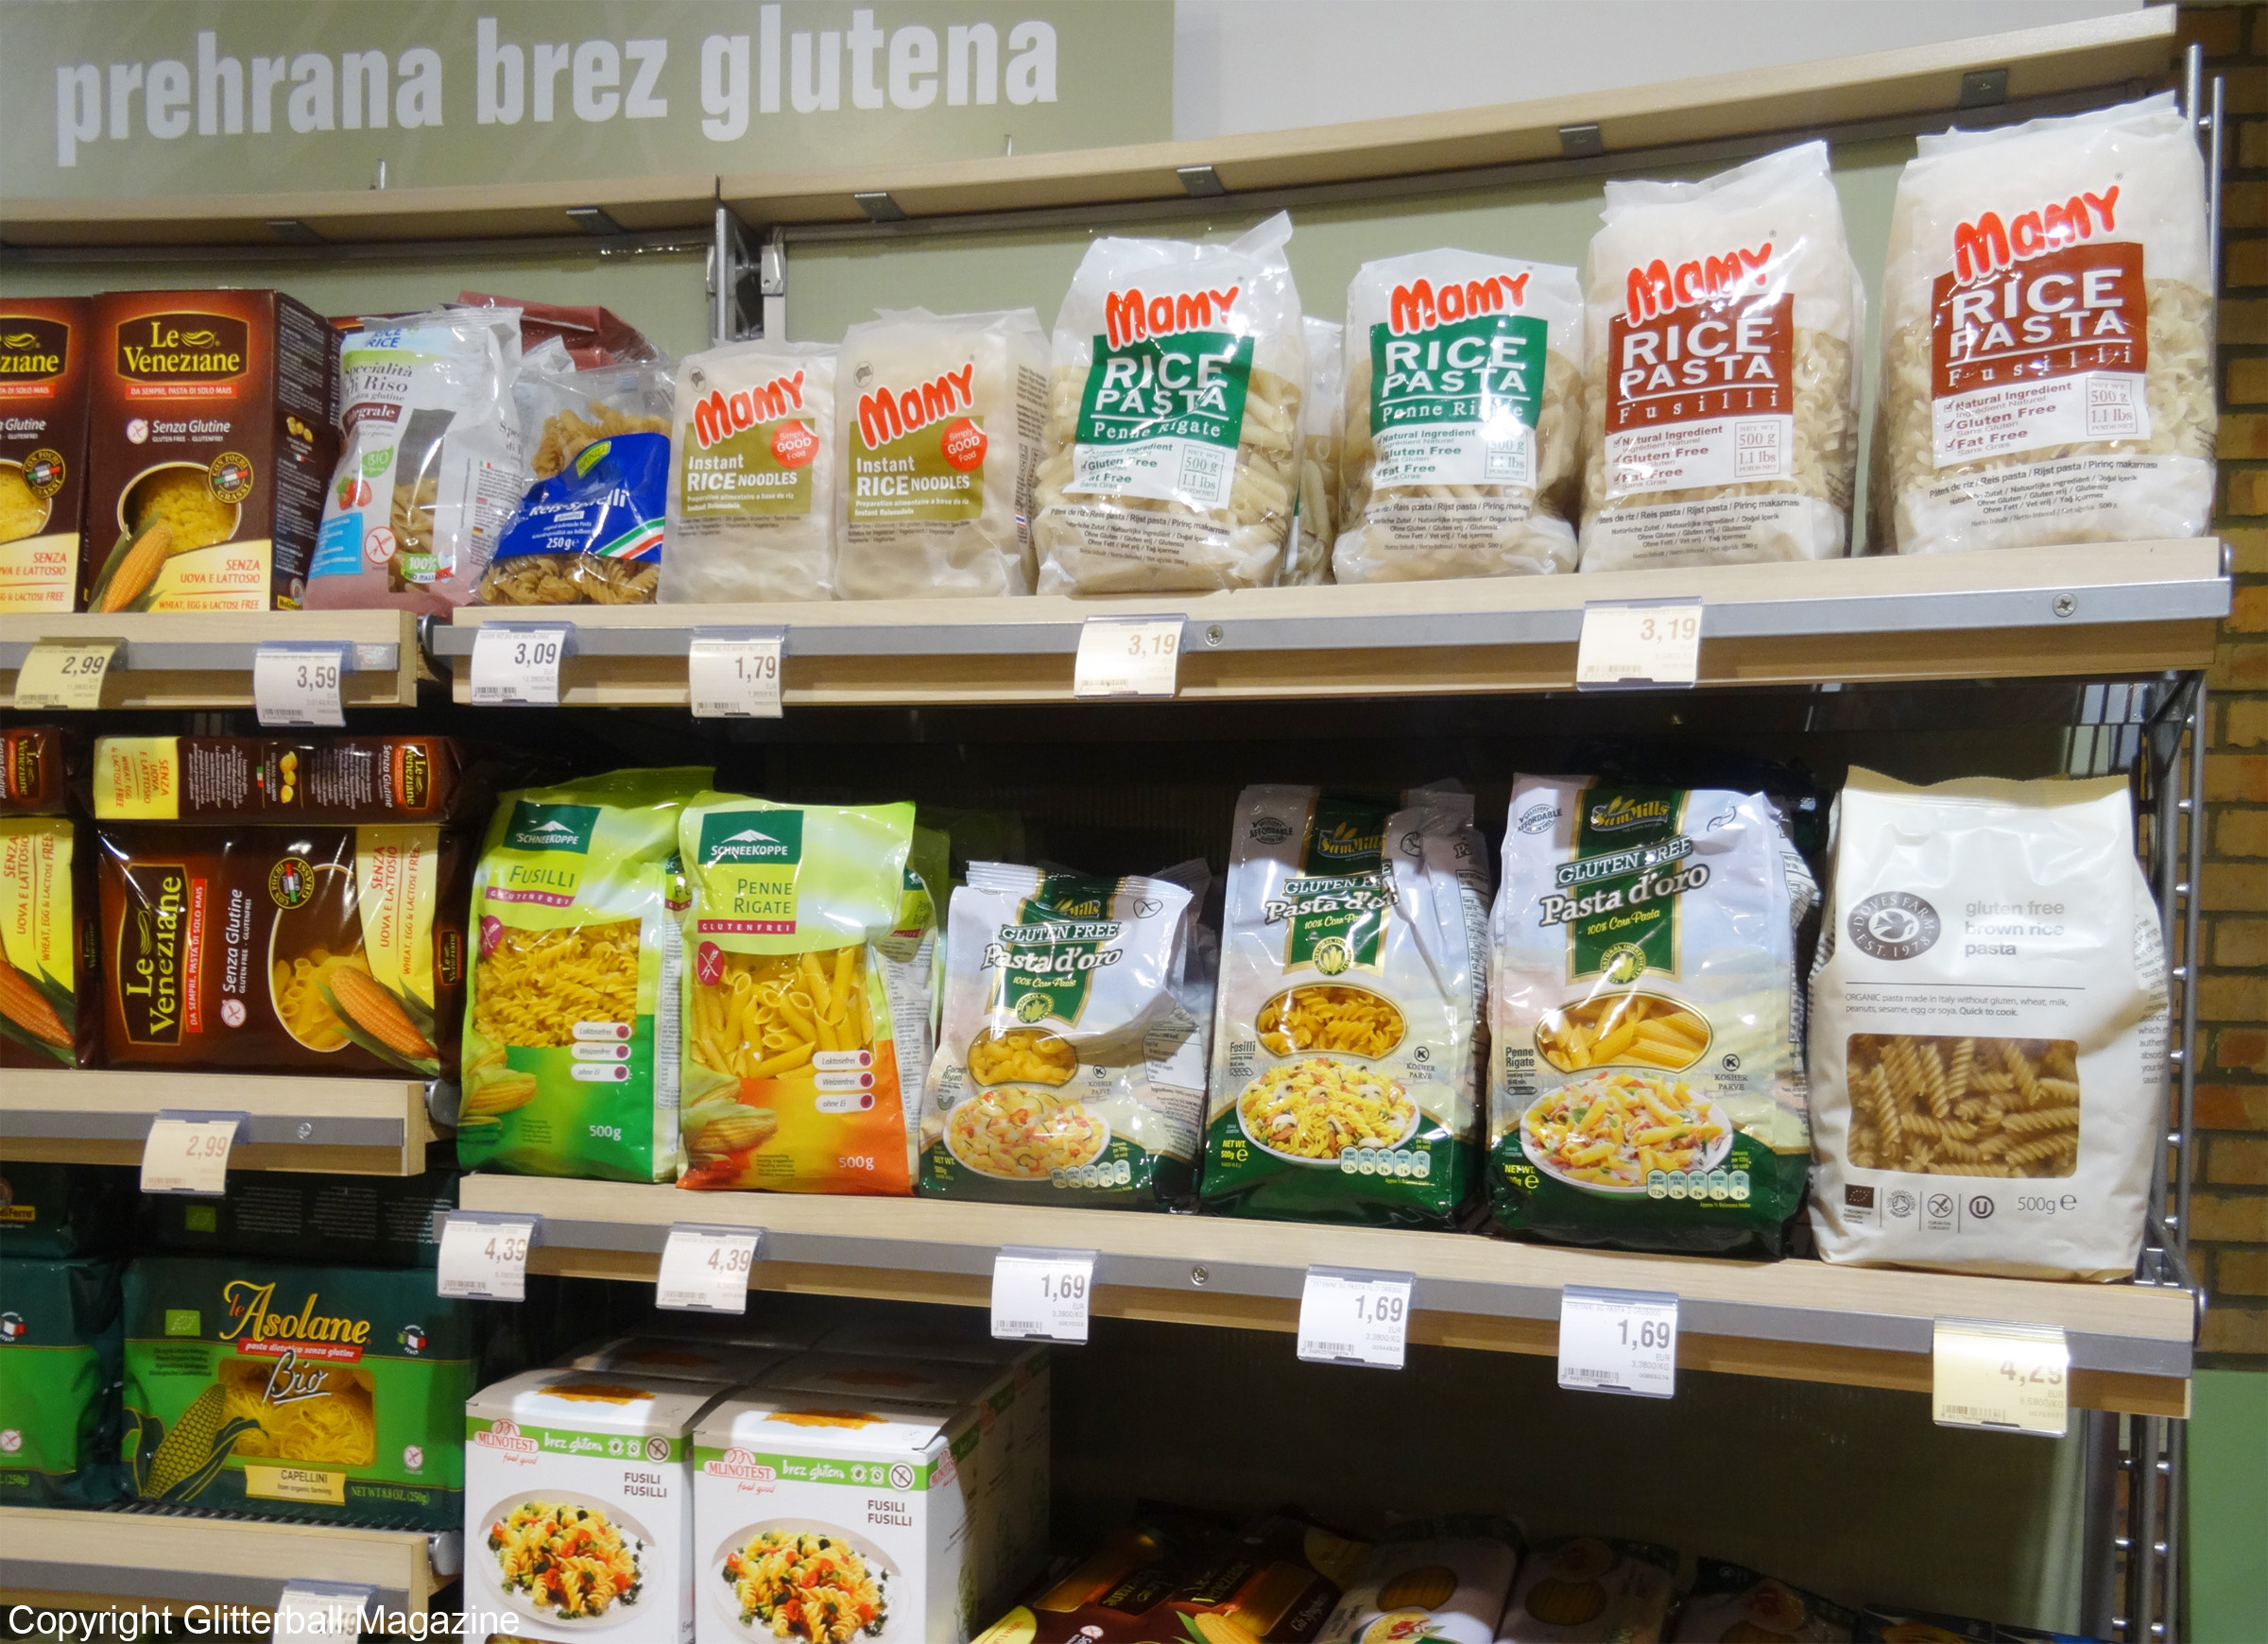 gluten-free-in-croatia-and-slovenia-16